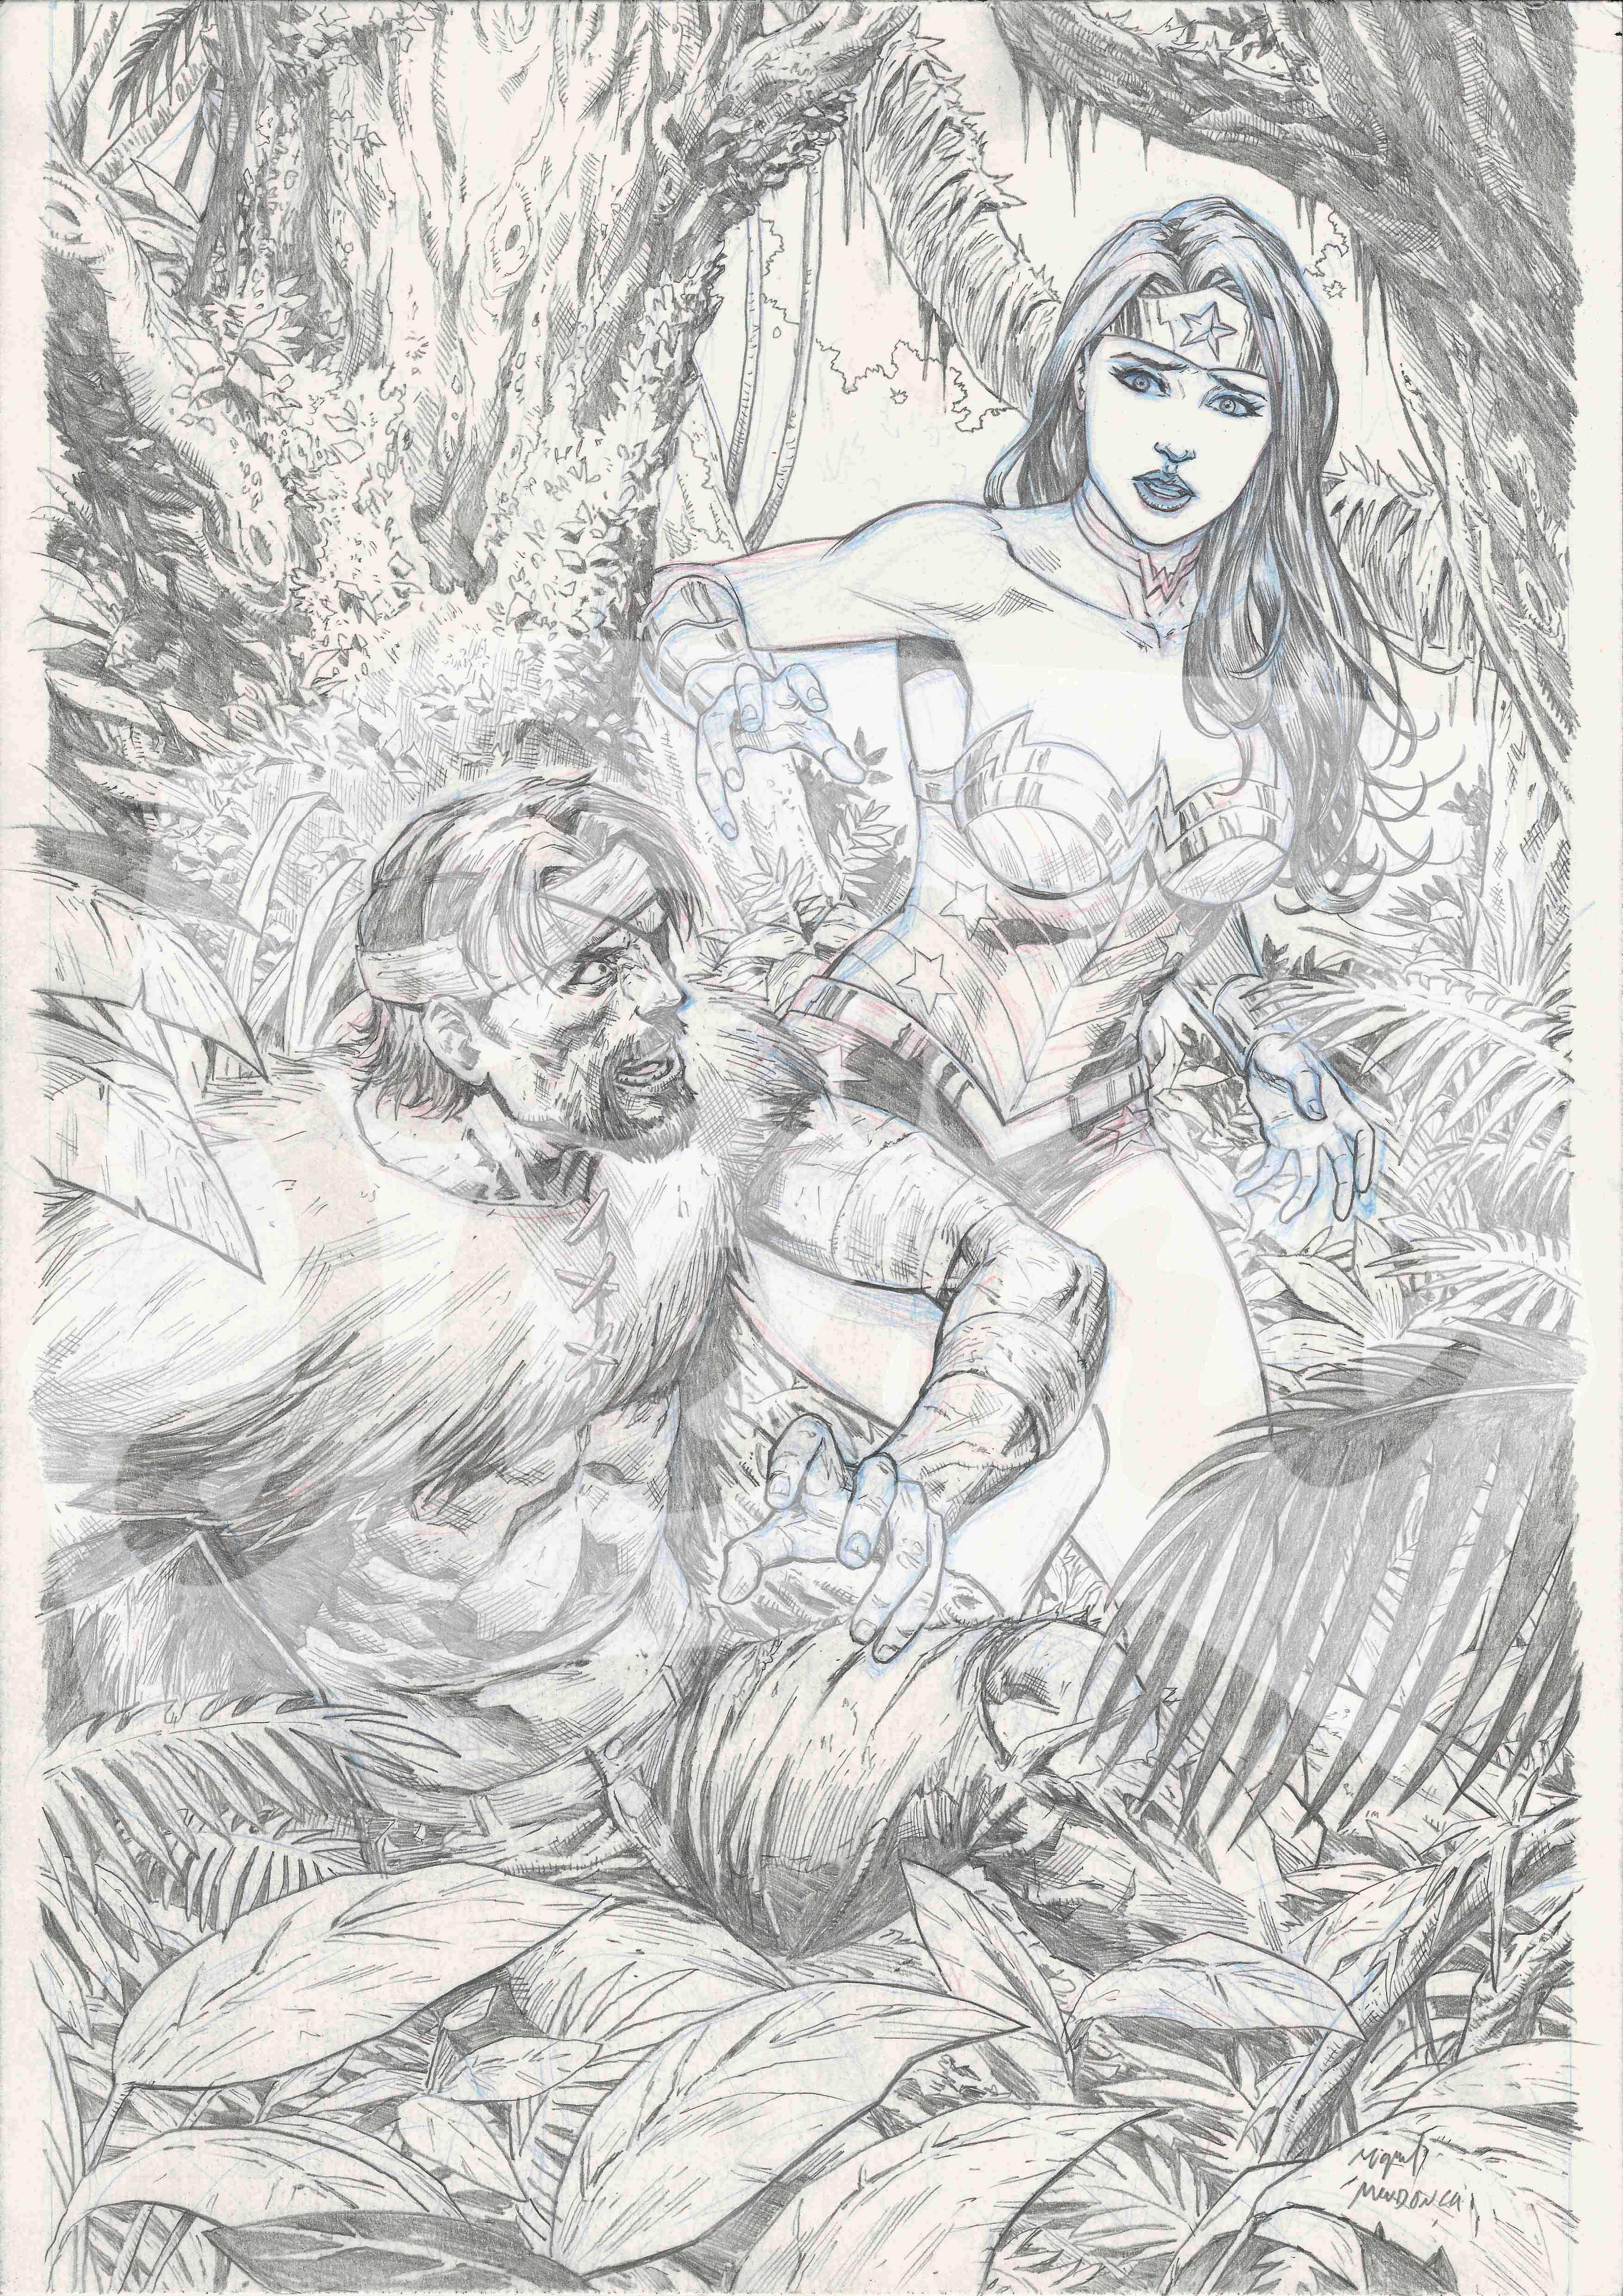 Wonder Woman #47 (page 8)